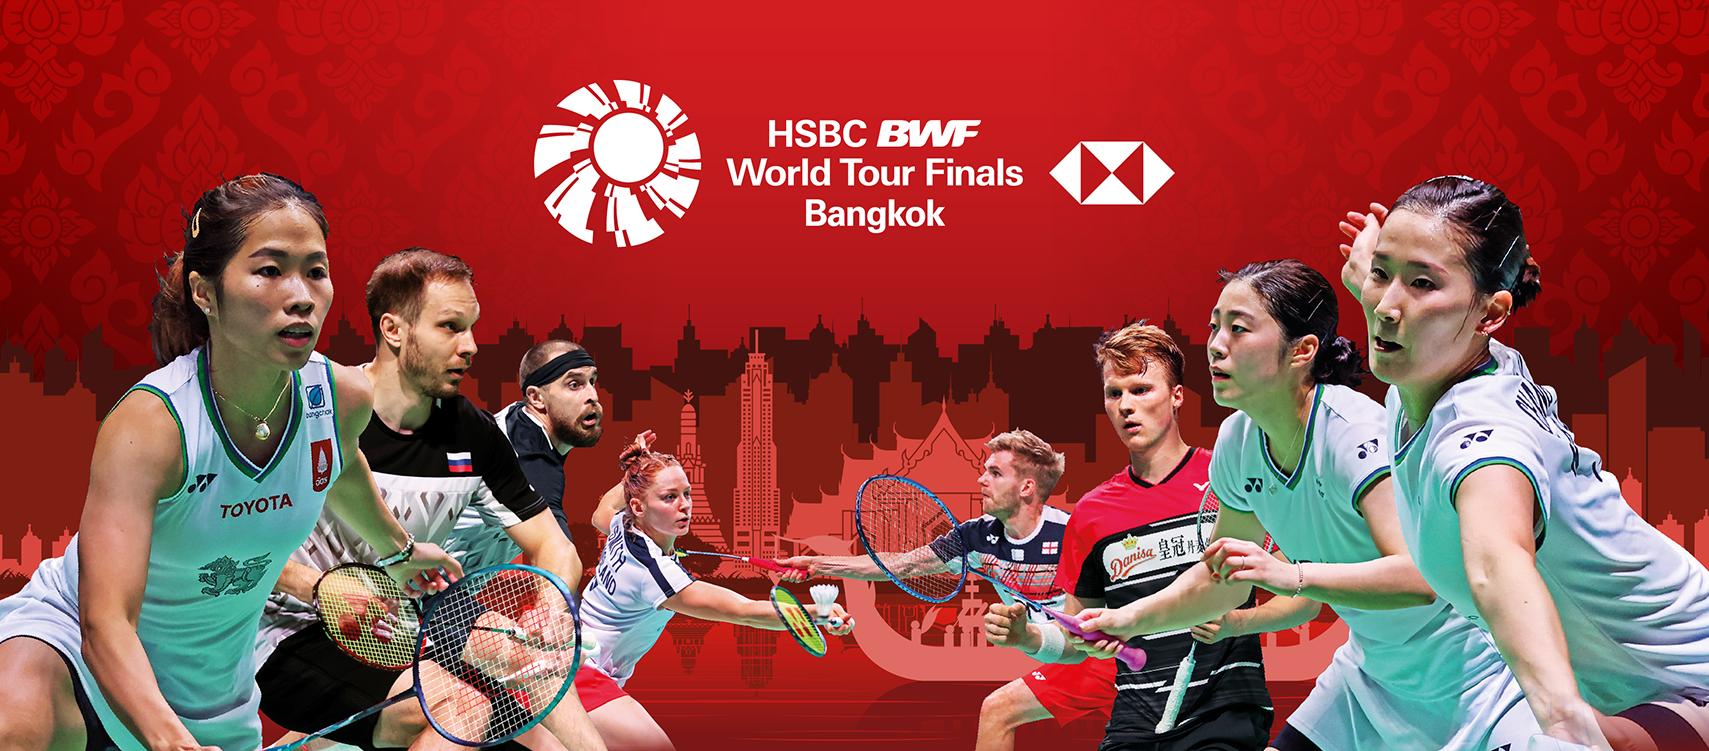 HSBC BWF World Tour Finals Qualifiers Announced